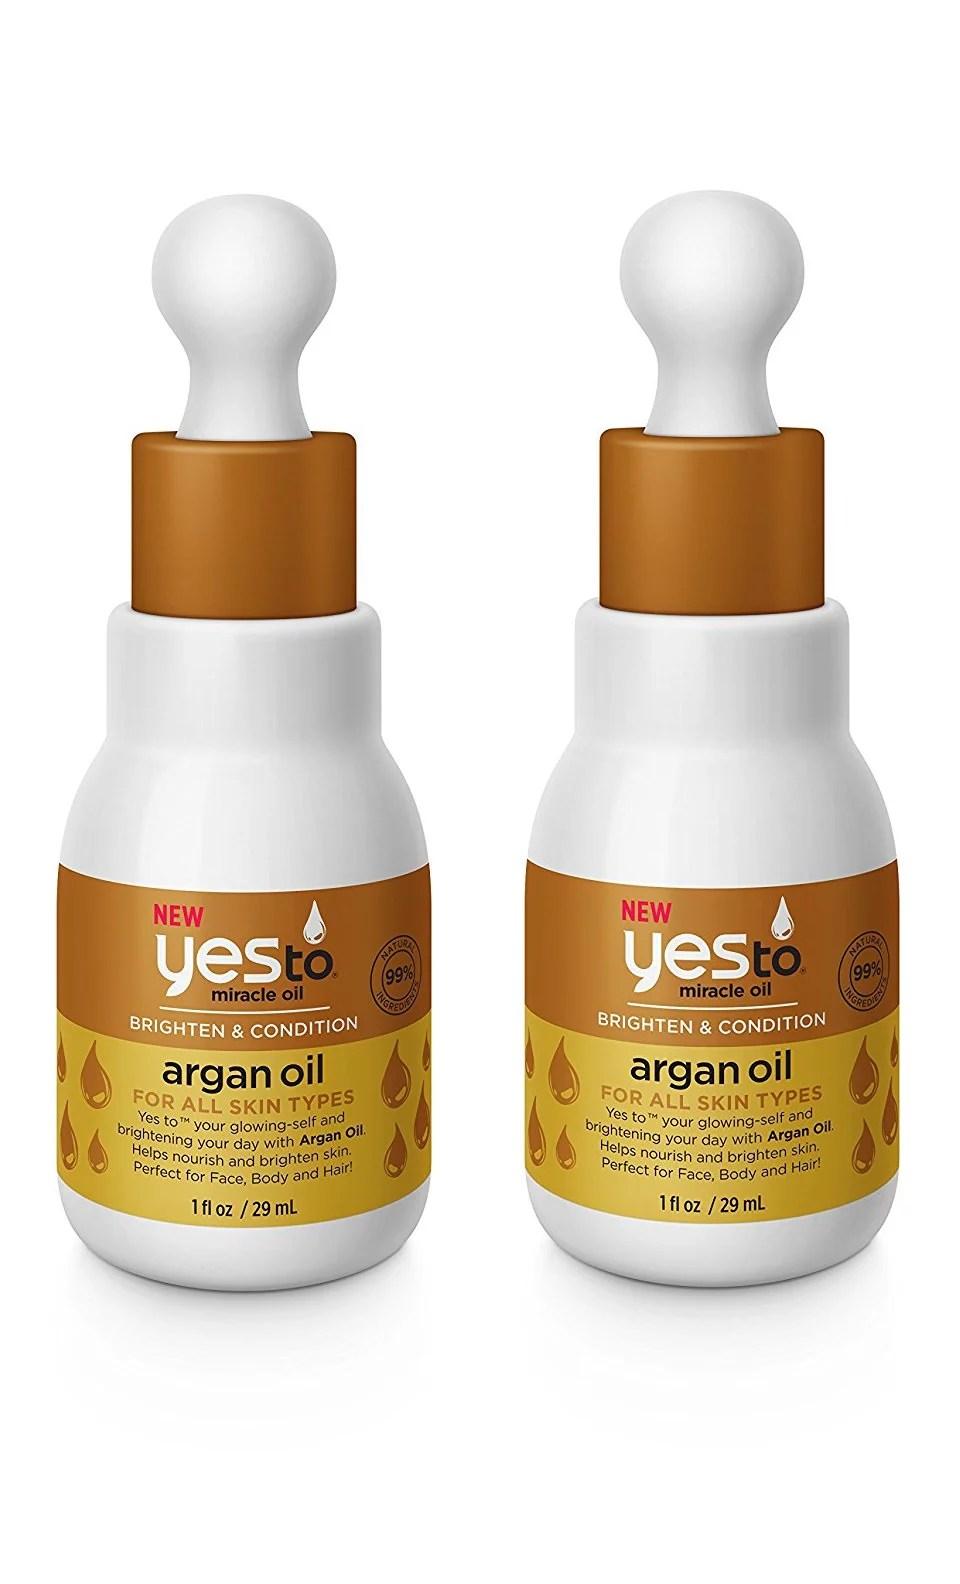 Argan Oil Eyebrows : argan, eyebrows, Miracle, Brighten, Condition, Argan, Types,, (Pack, Eyebrow, Ruler, Walmart.com